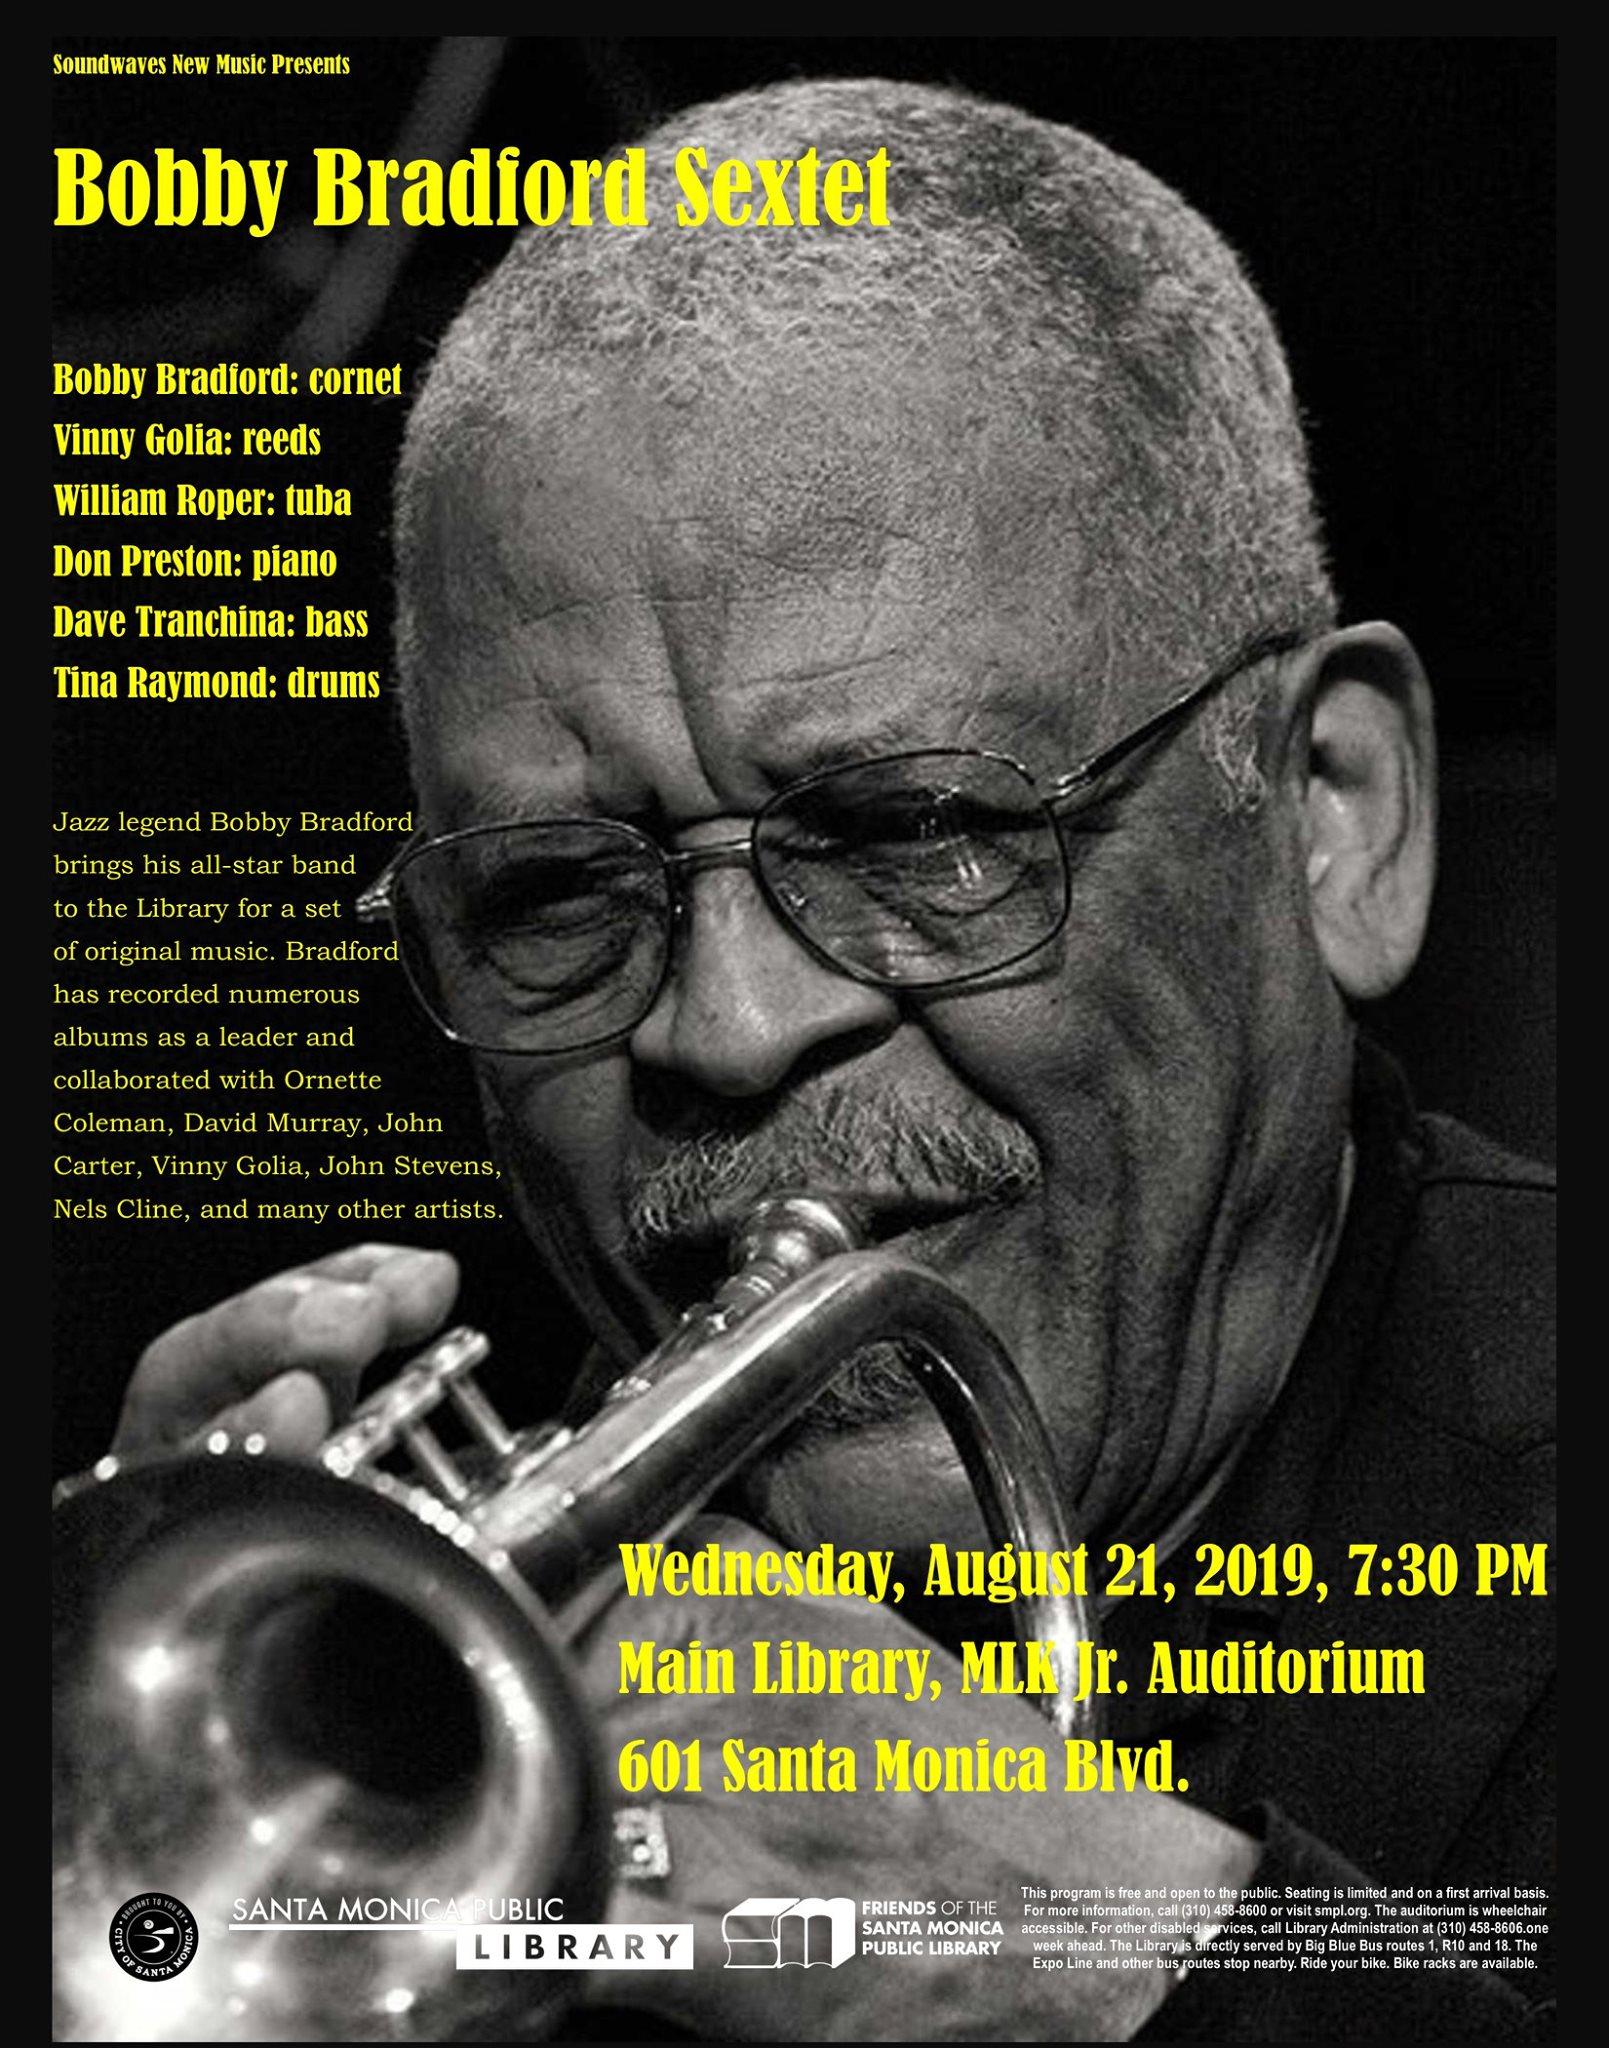 event image for 08/21/2019: with Bobby Bradford Sextet, MLK Jr. Auditorium, Santa Monica Library